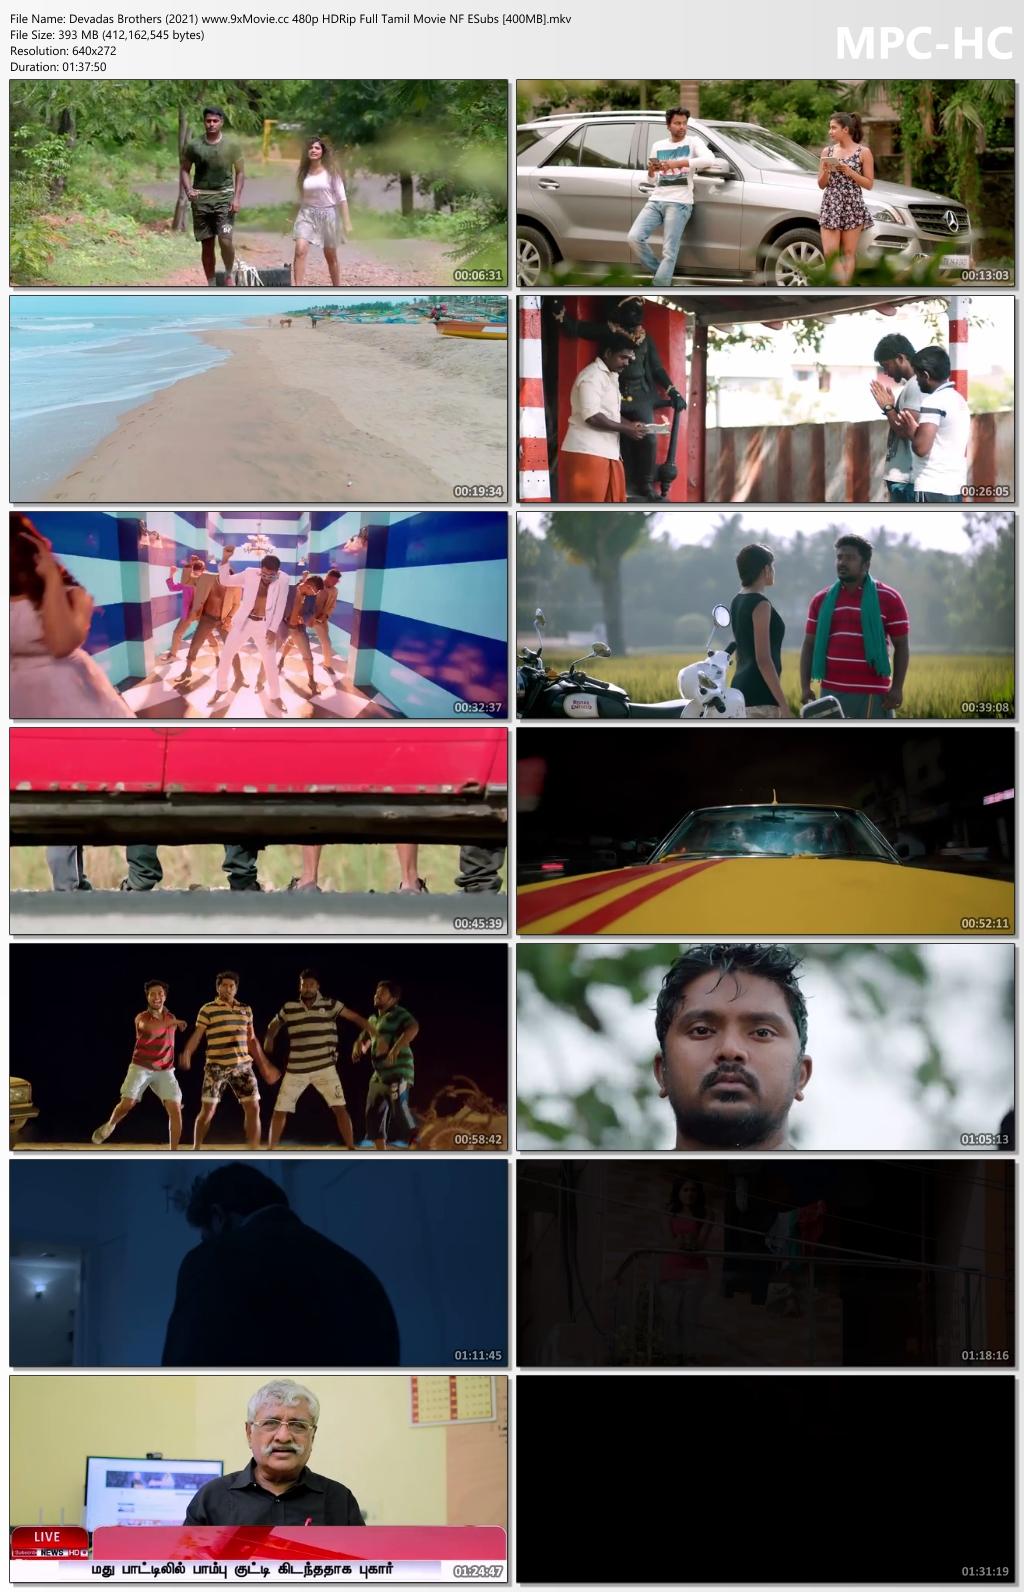 Devadas-Brothers-2021-www-9x-Movie-cc-480p-HDRip-Full-Tamil-Movie-NF-ESubs-400-MB-mkv